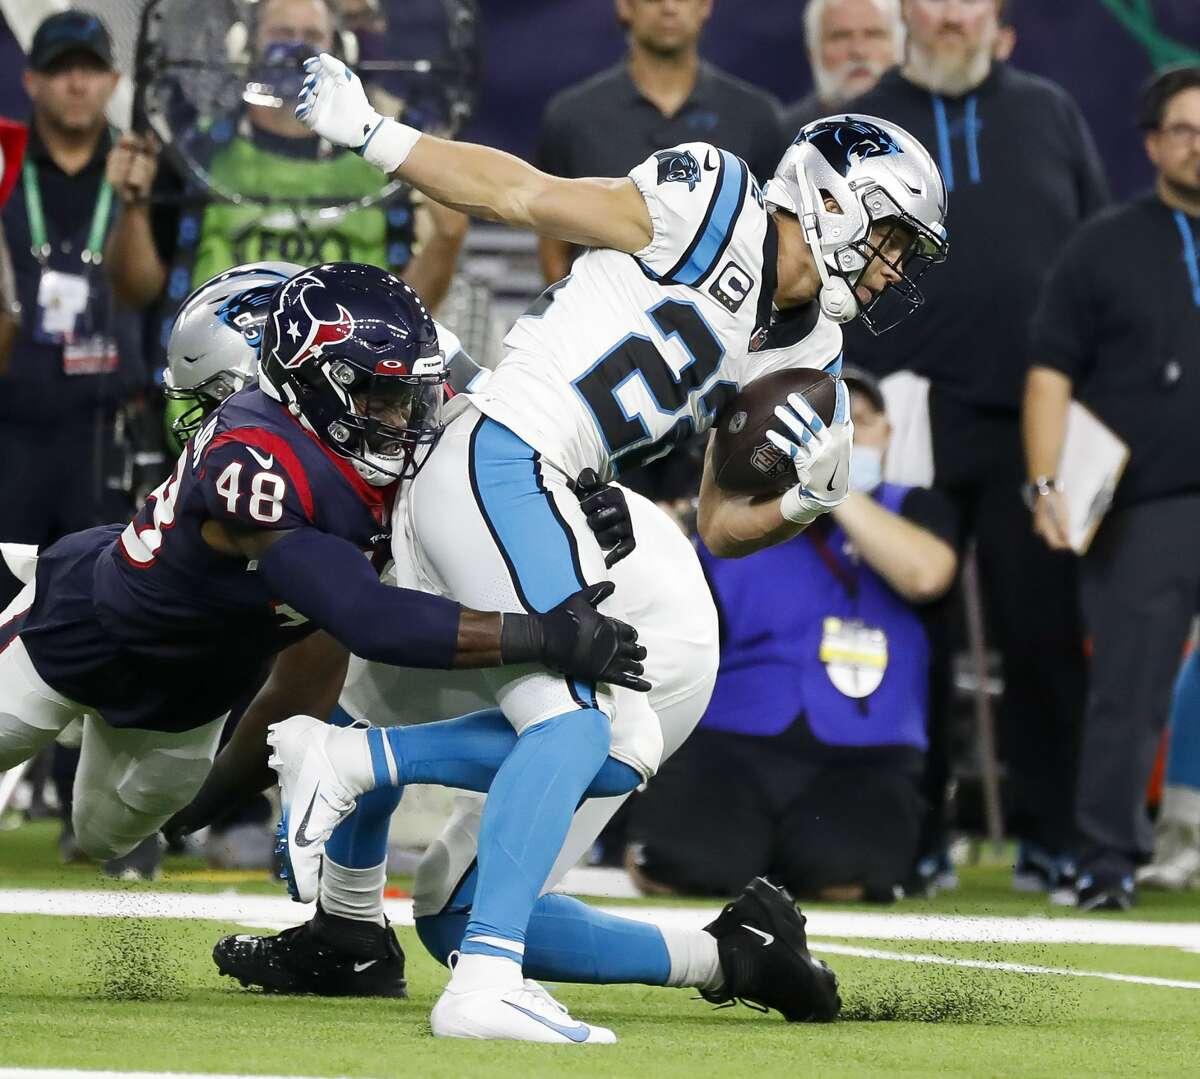 Carolina Panthers running back Christian McCaffrey (22) tries to run through Houston Texans linebacker Joe Thomas (48) during the first quarter of an NFL football game at NRG Stadium, Thursday, September 23, 2021, in Houston.